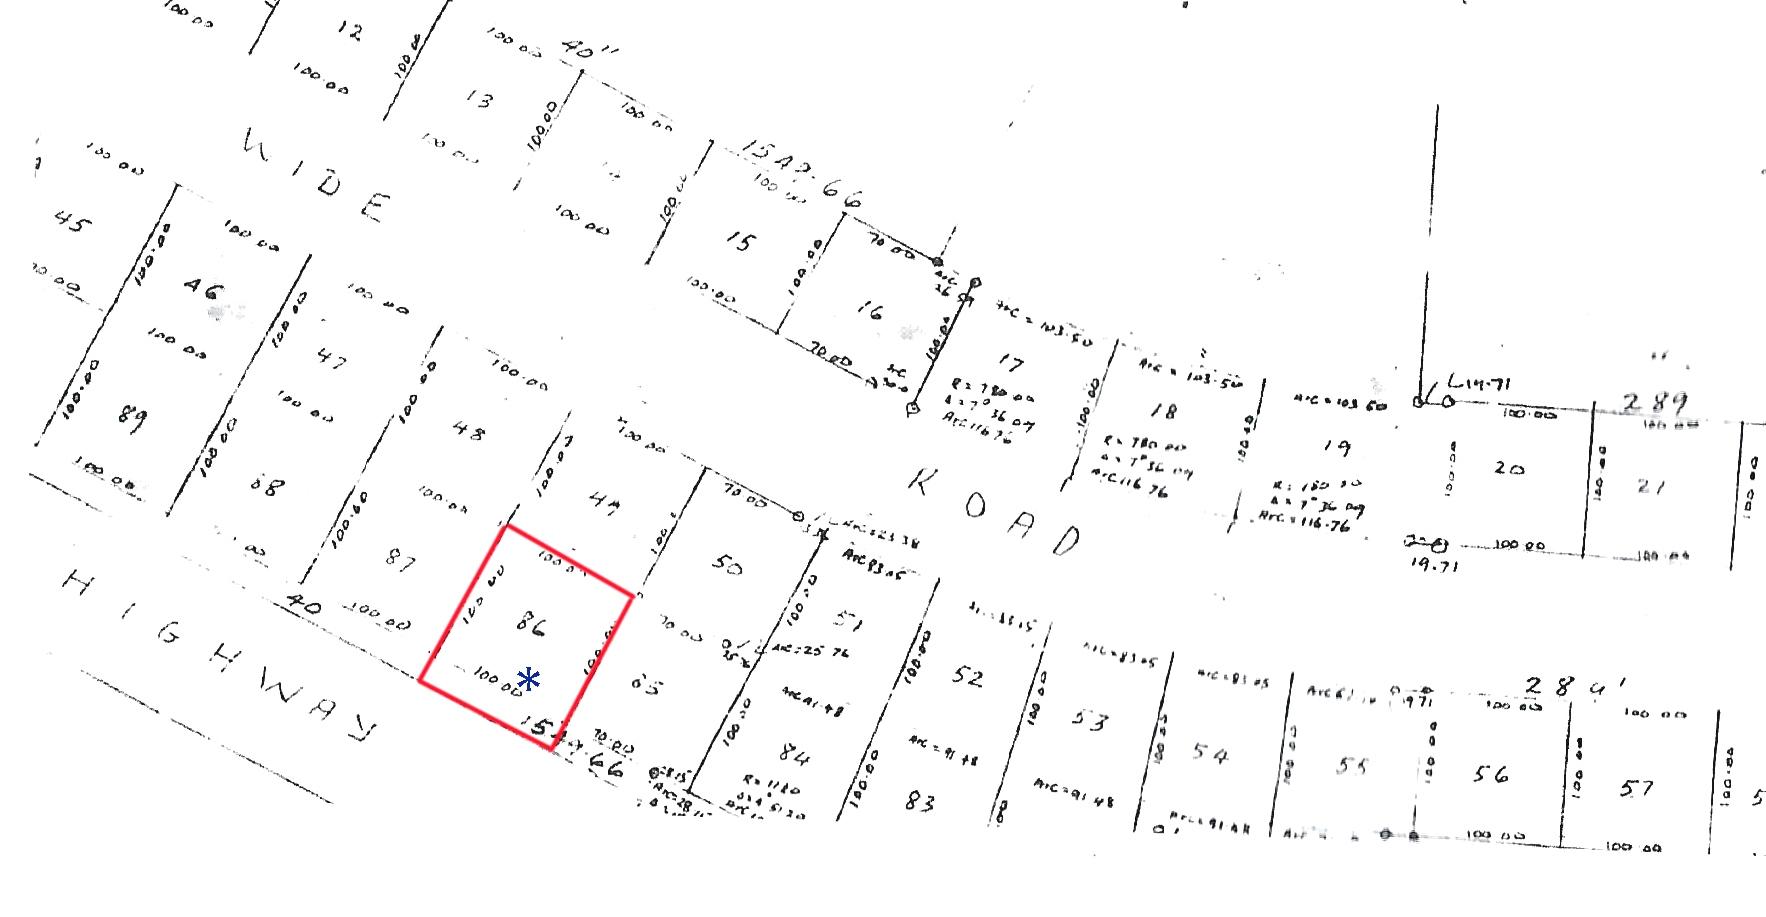 Land for Sale at Commercial Vacant Property Treasure Cay Abaco Treasure Cay, Abaco, Bahamas